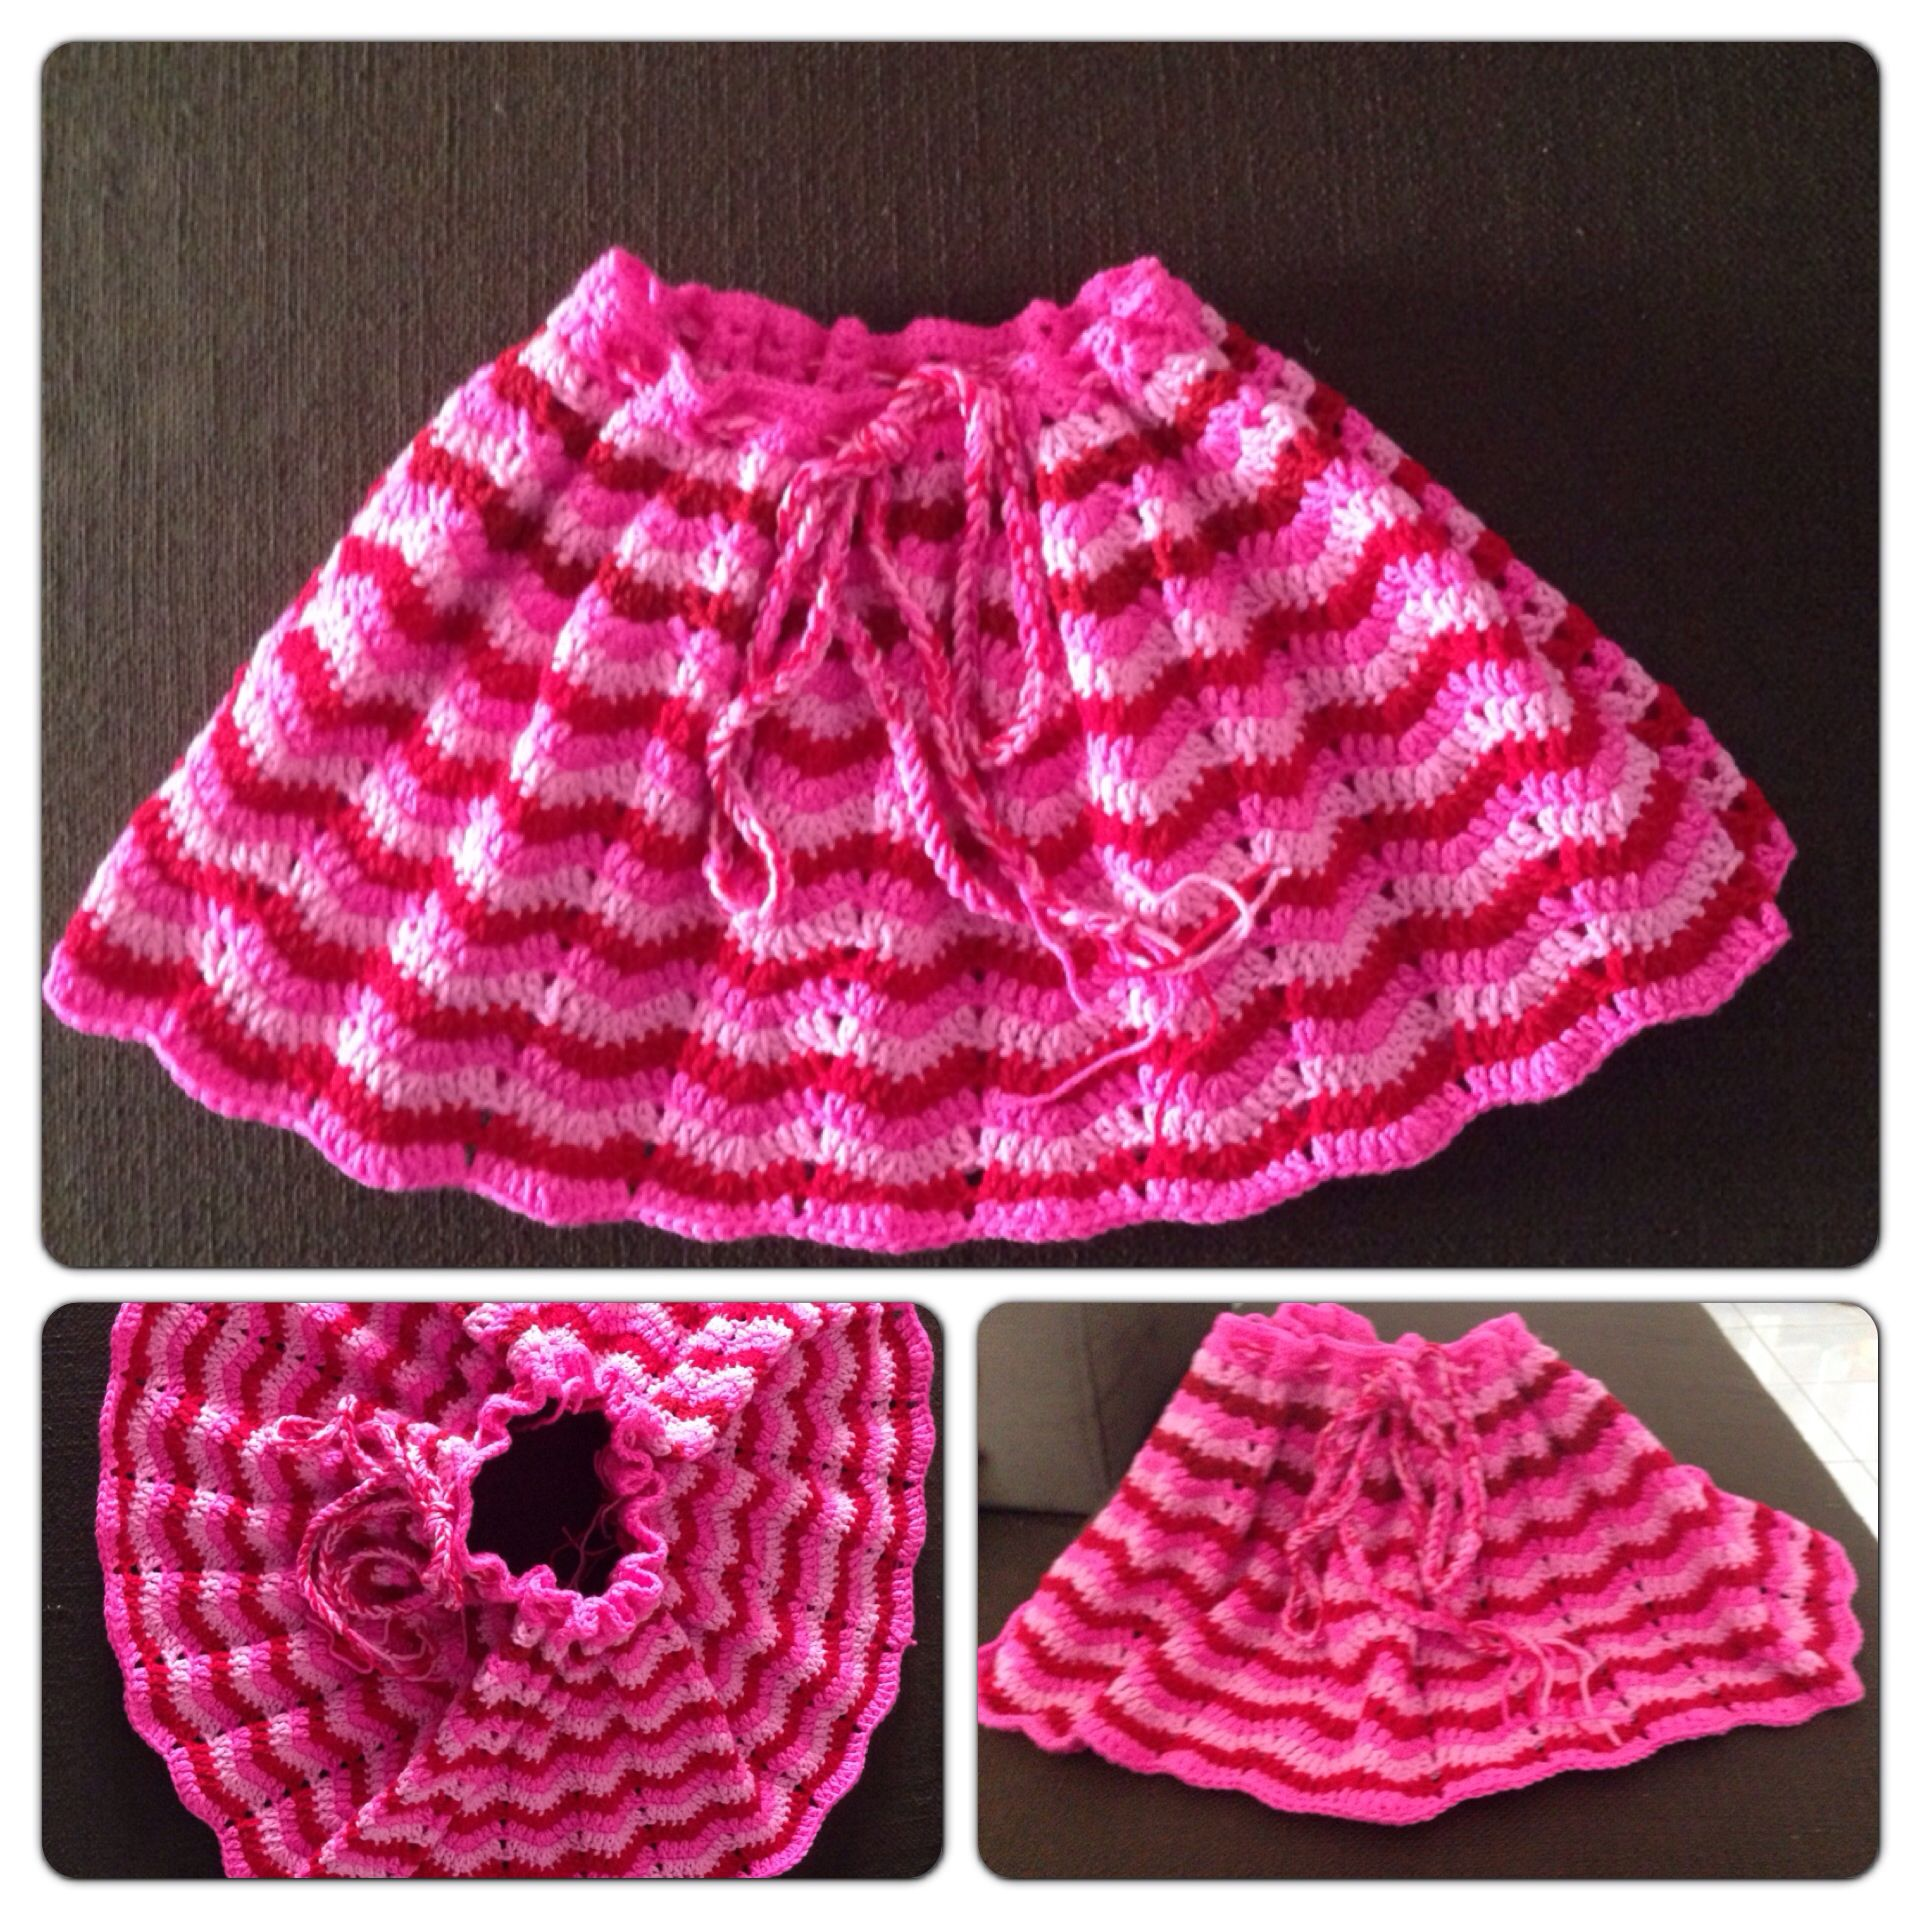 Crochet wave pattern adult poncho cum toddler skirt my crochet crochet wave pattern adult poncho cum toddler skirt dt1010fo